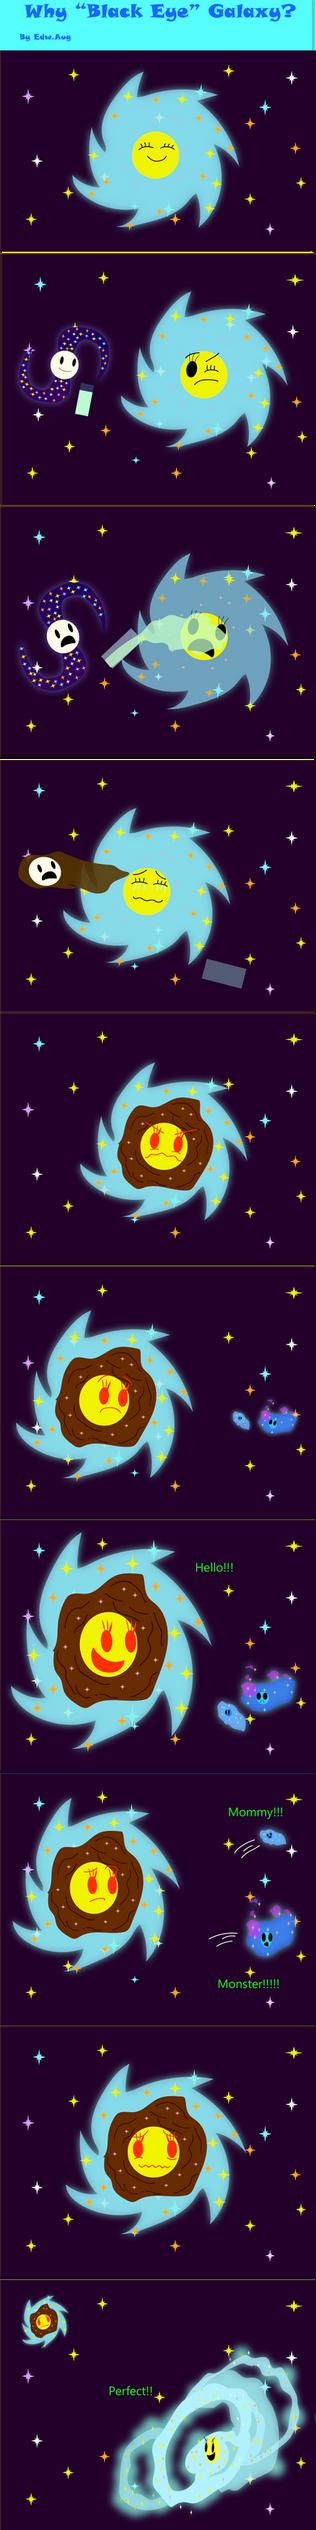 Astronomical Comics: ep 8 by Edu1806031122